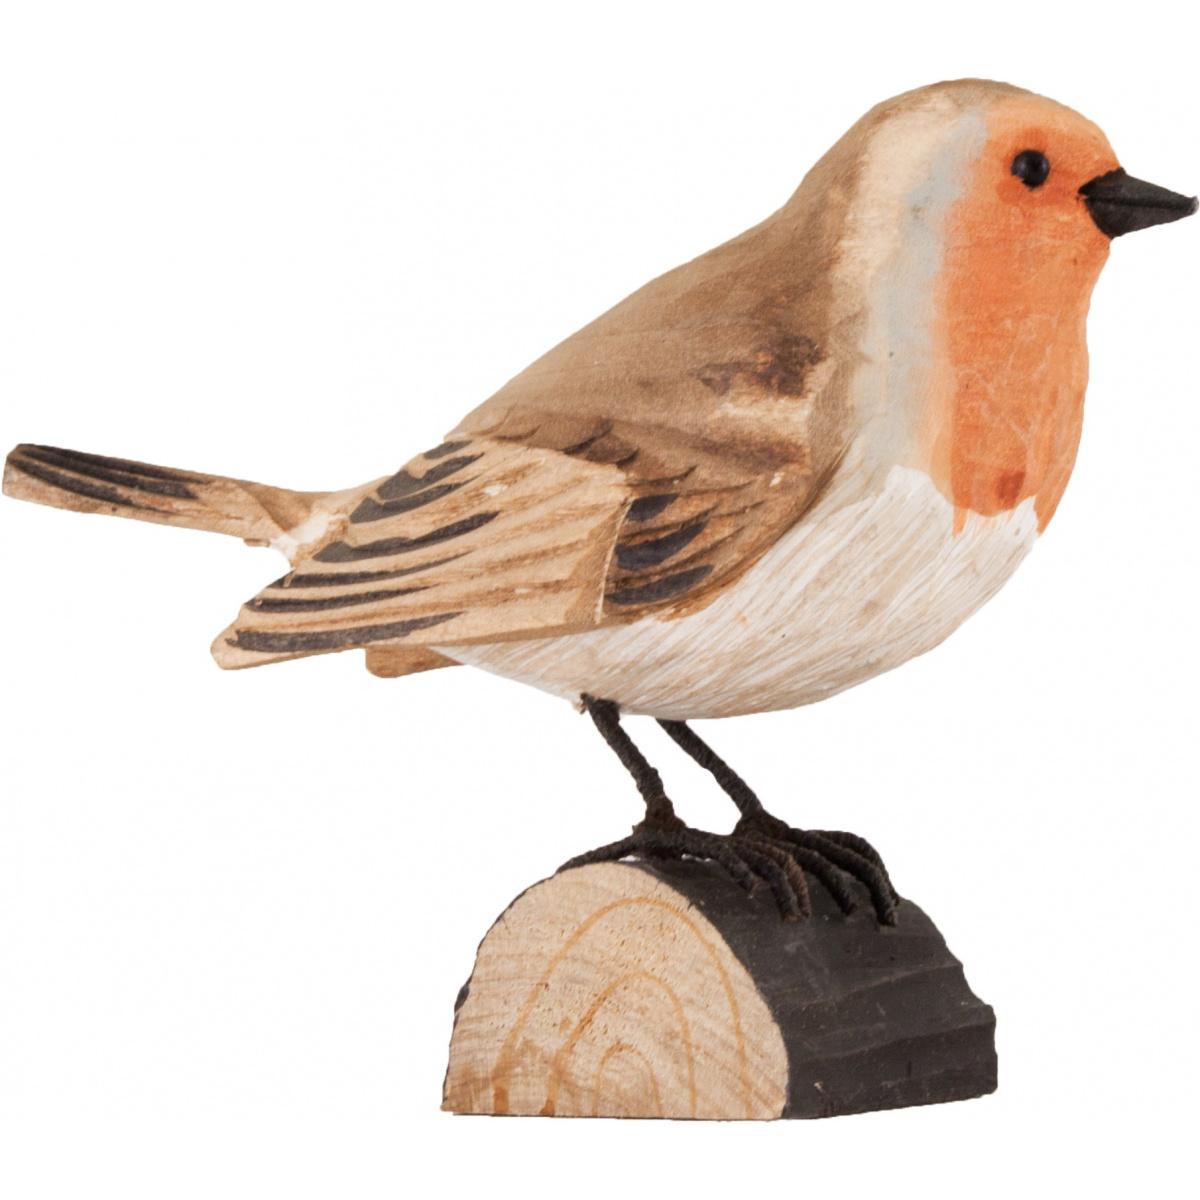 Wildlife Garden træfugl - rødhals